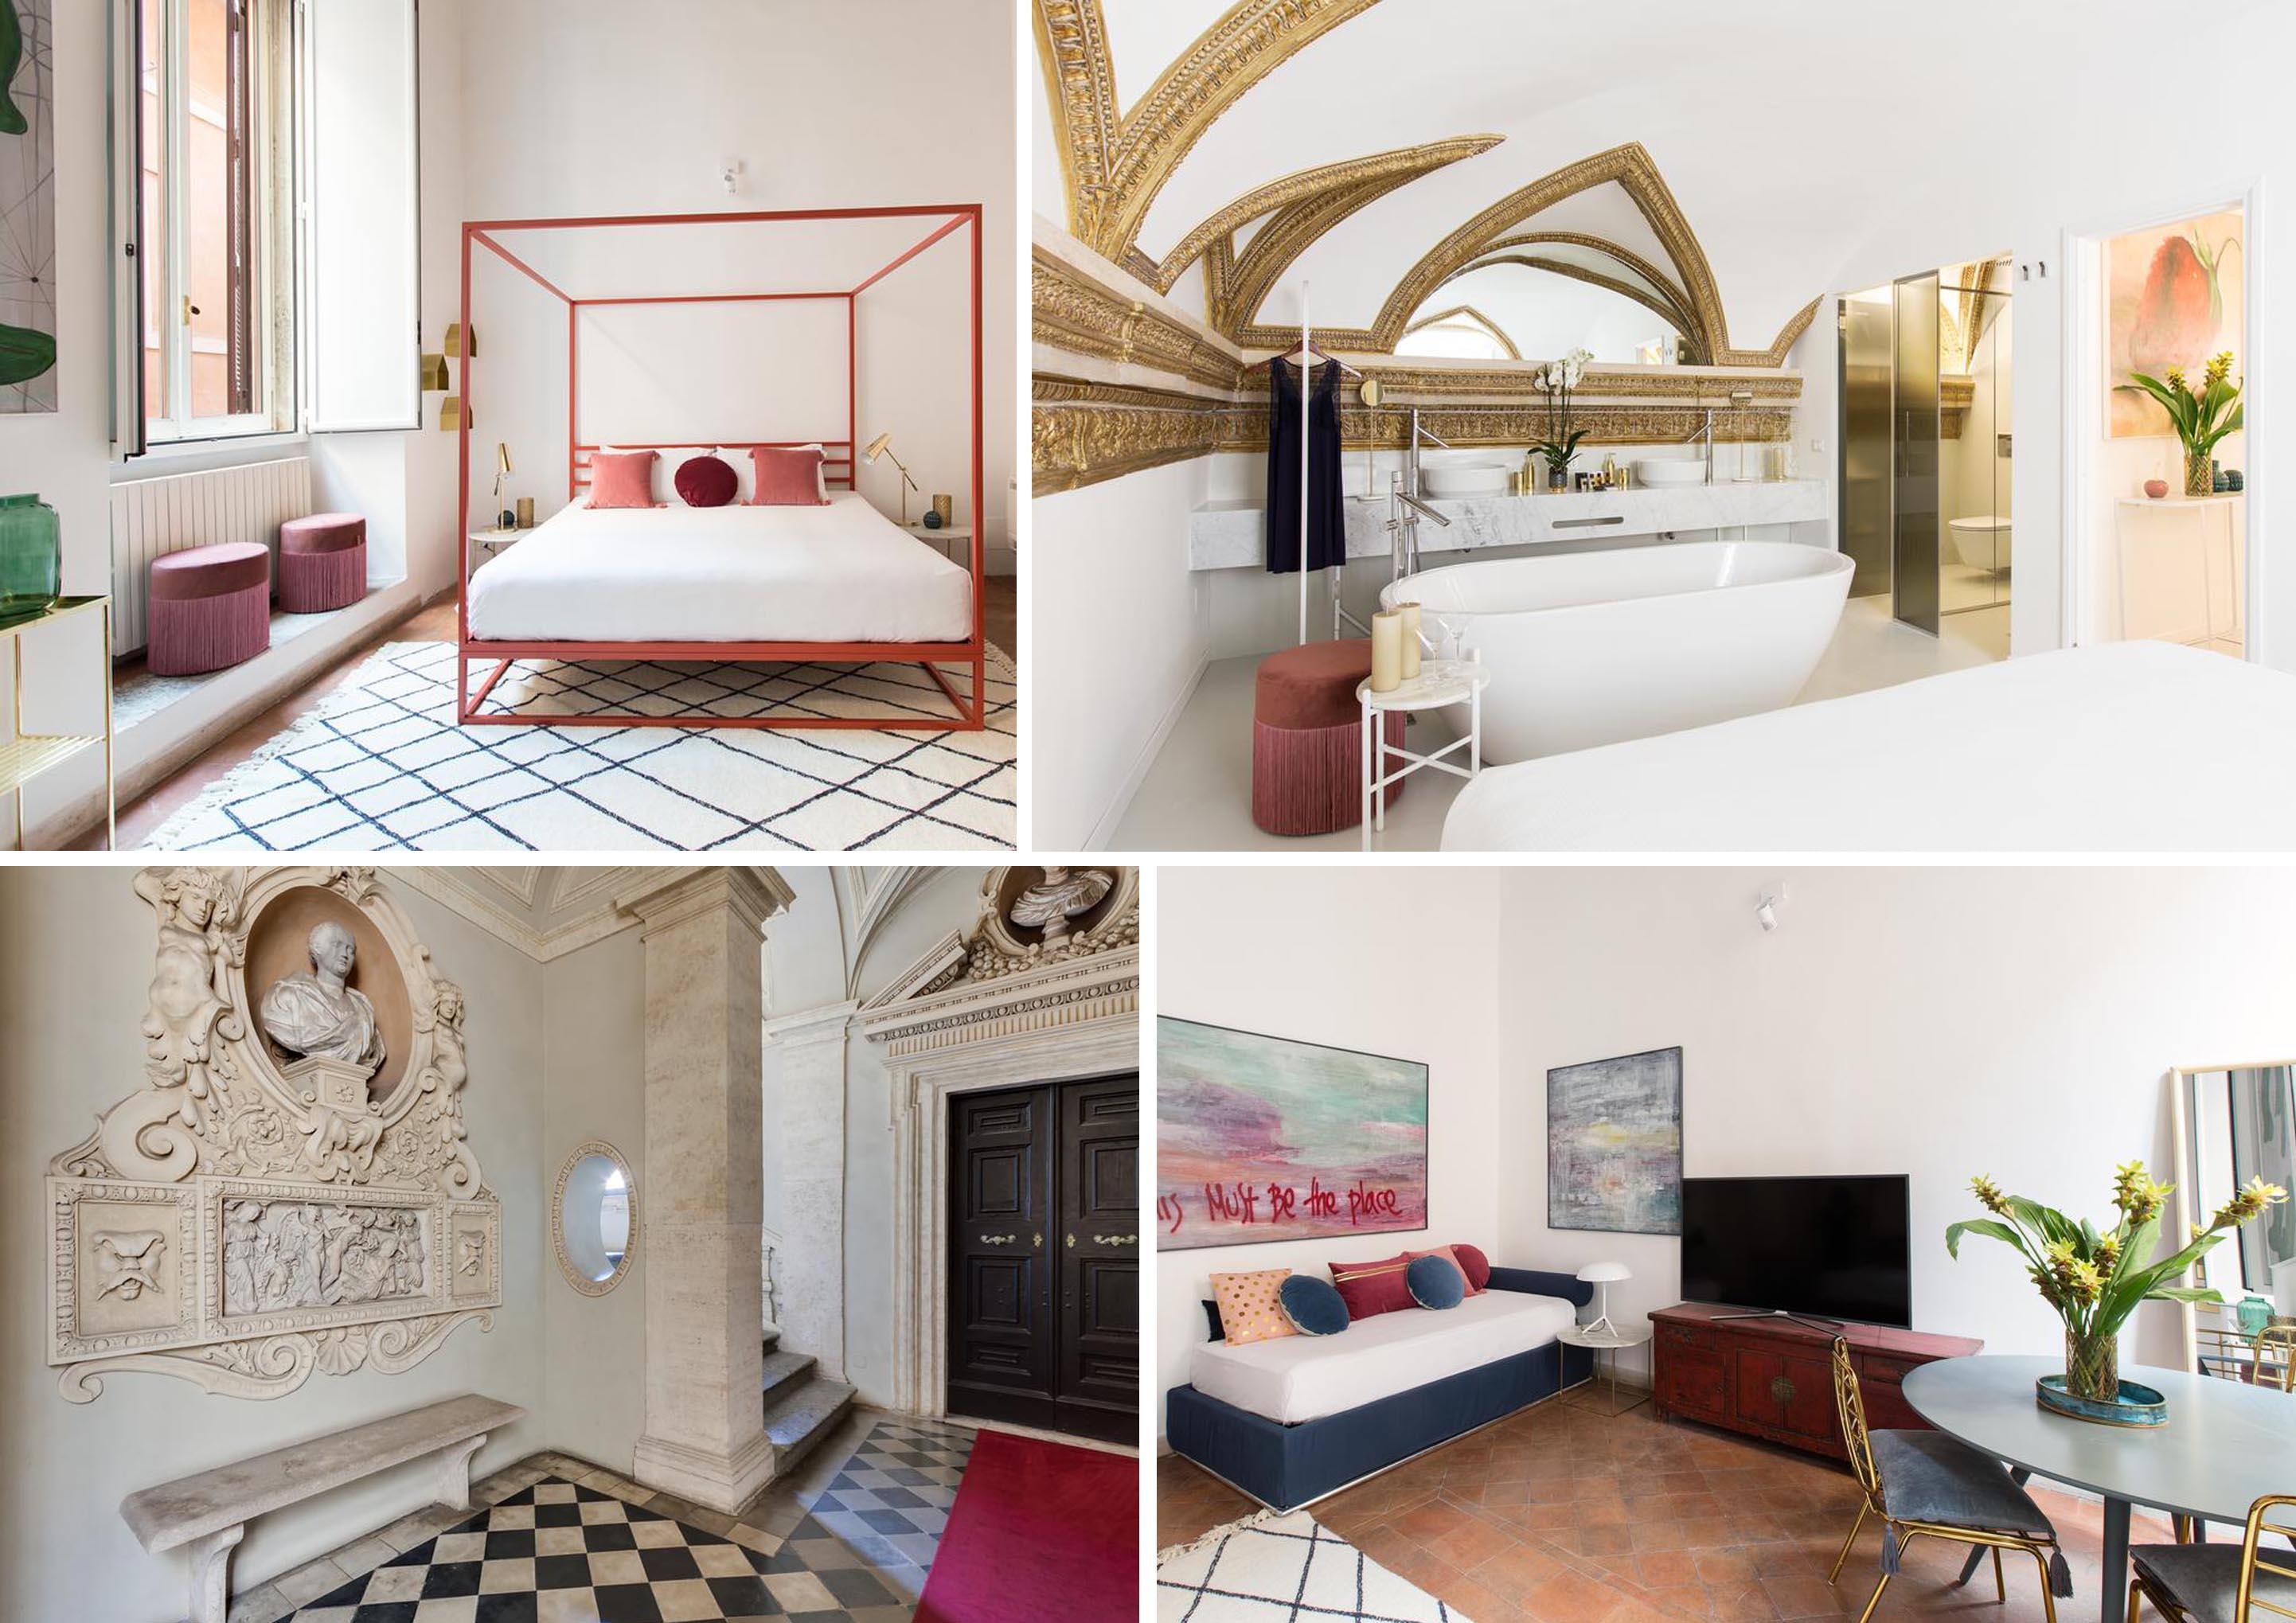 Costaguti experience nuovo hotel a Roma